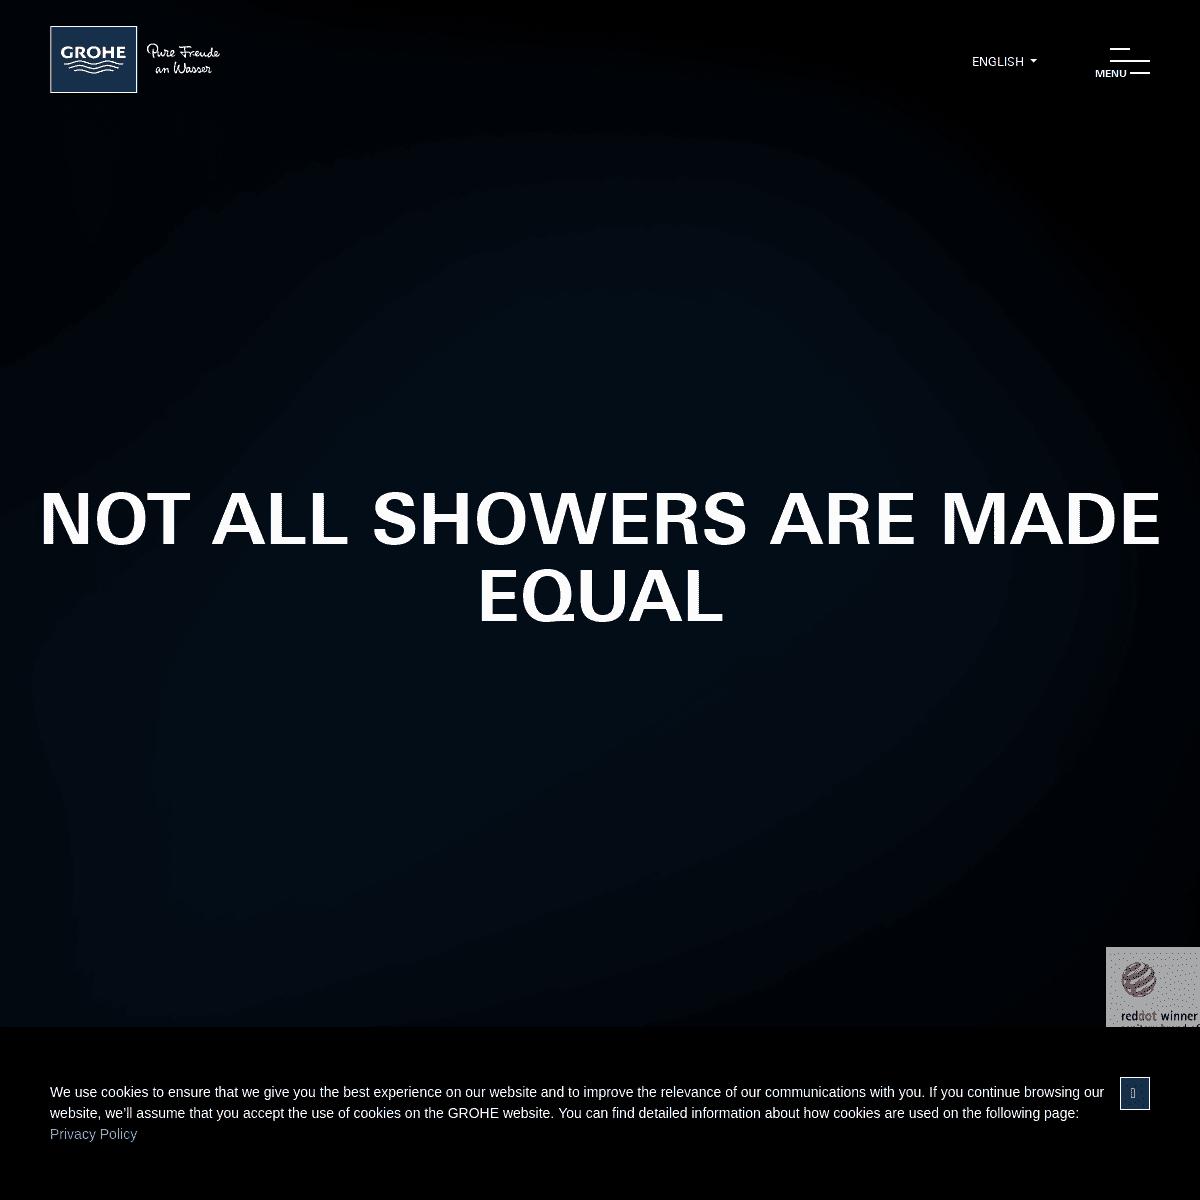 GROHE - #NotAllShowersAreMadeEqual